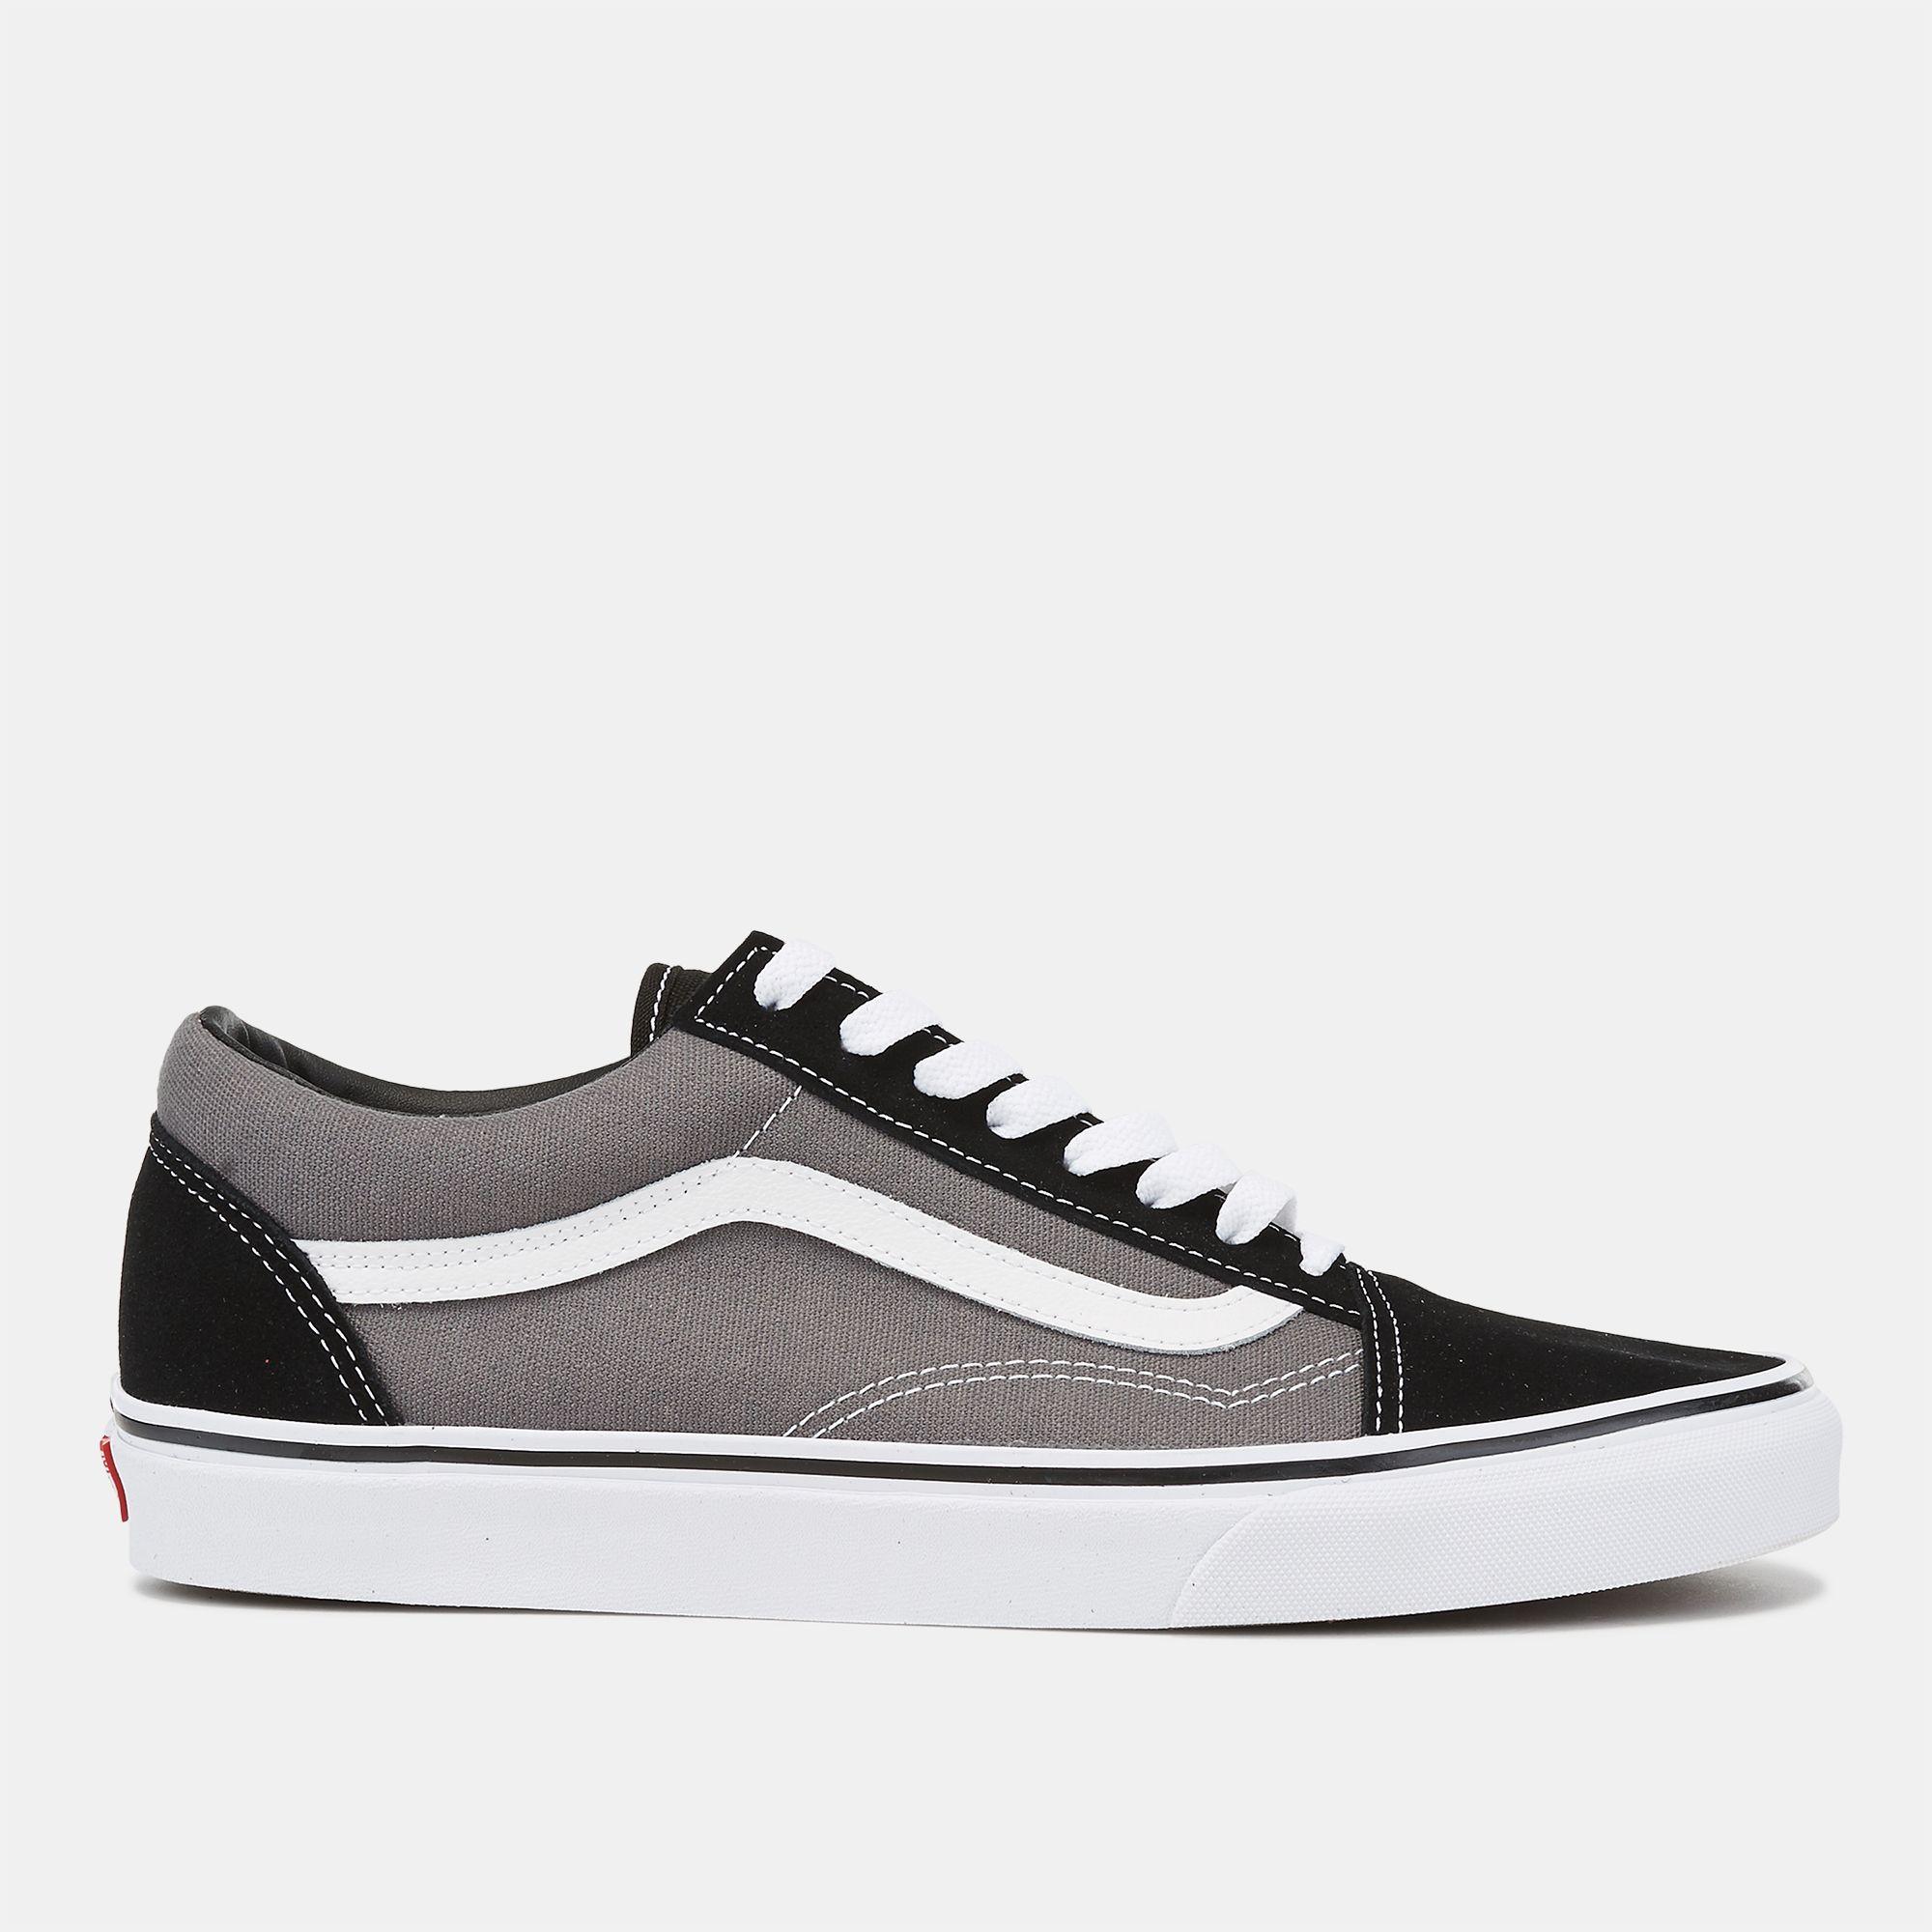 efa7ddce8 حذاء أولد سكول من فانس | احذية سنيكرز للرجال | احذية للرجال | للرجال ...